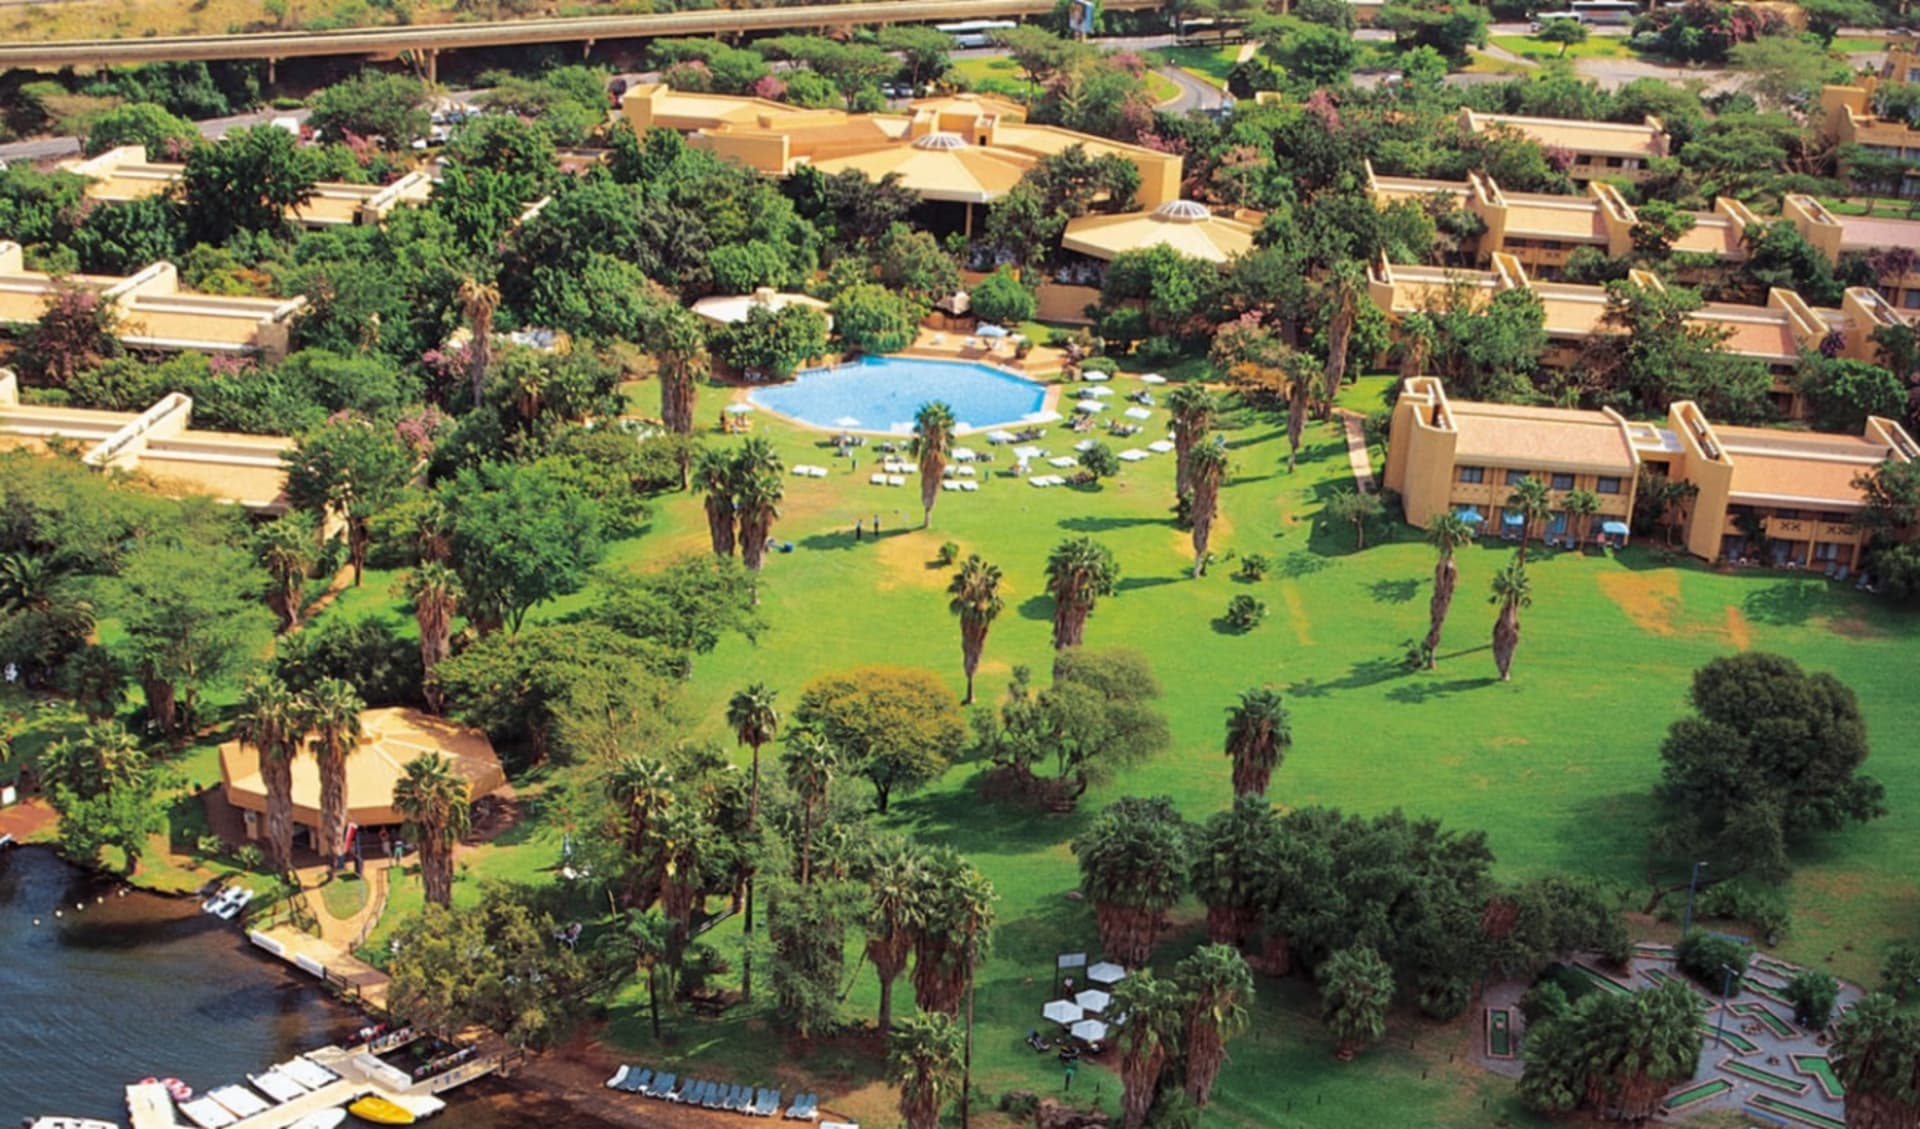 Sun City Cabanas Hotel: 09_117_2_Sun City Canabas